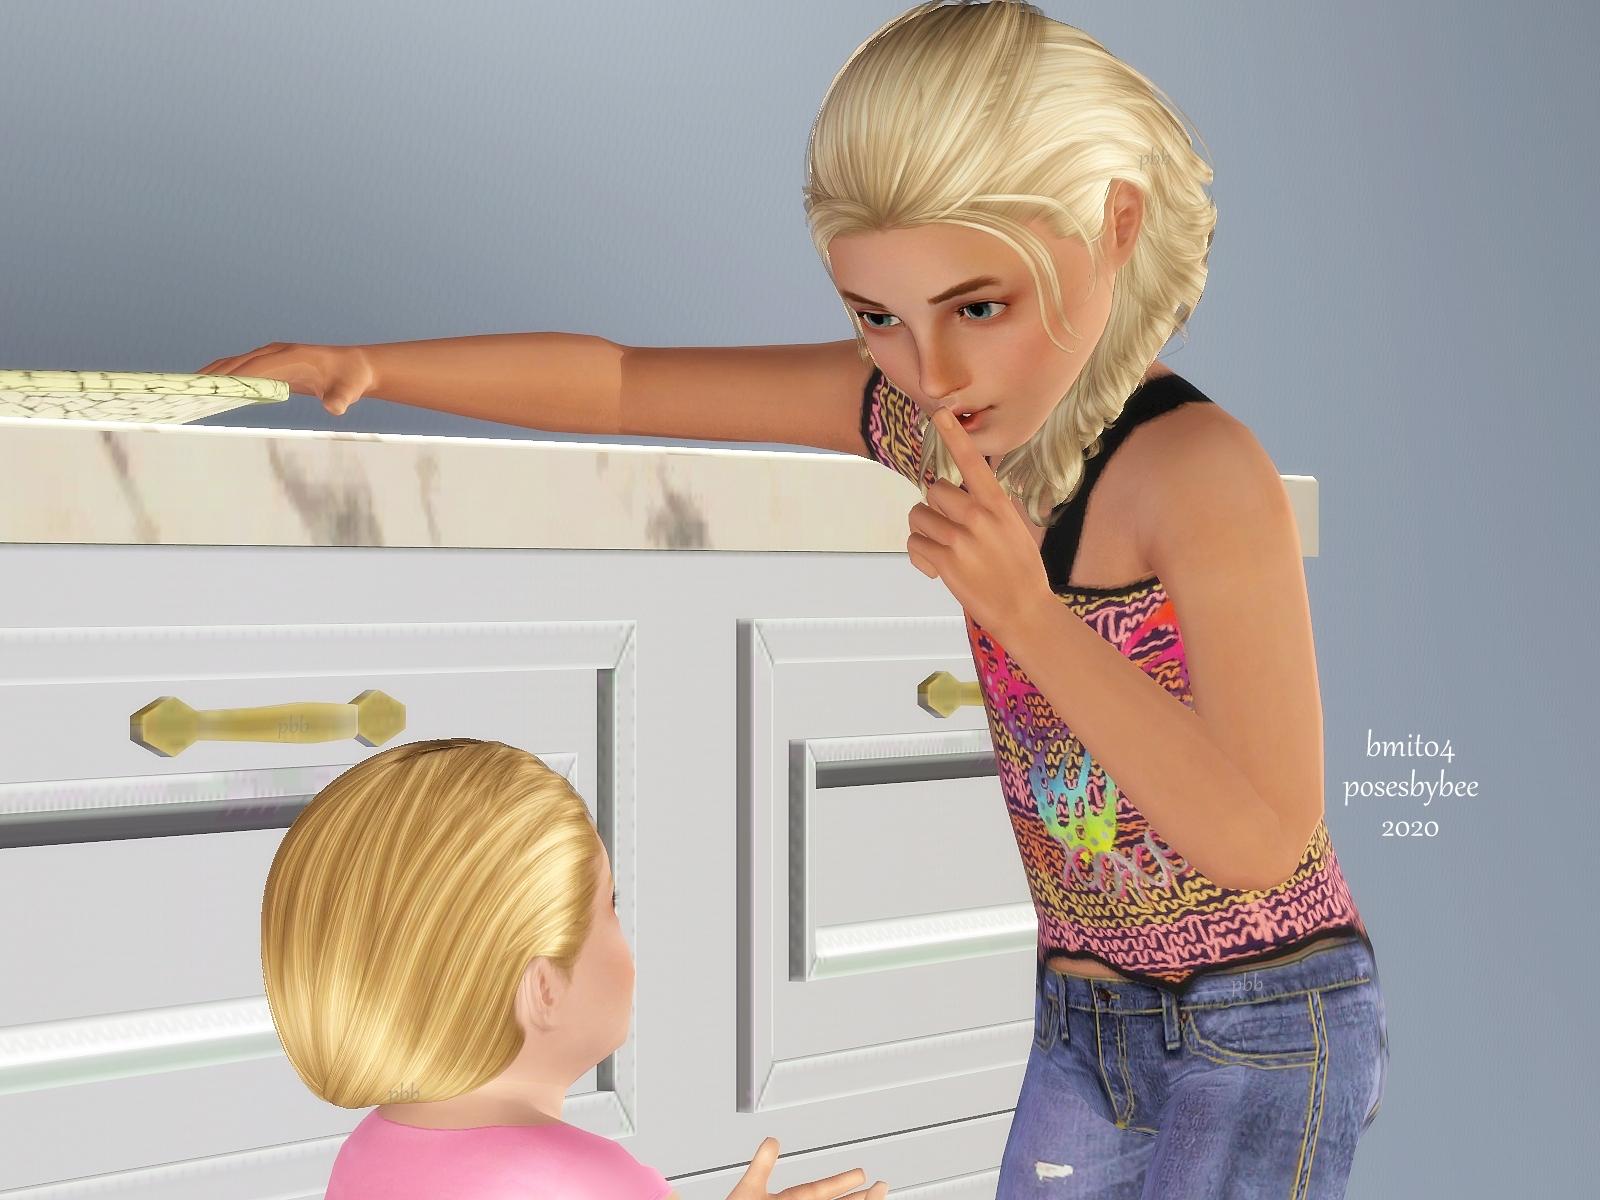 sibling13